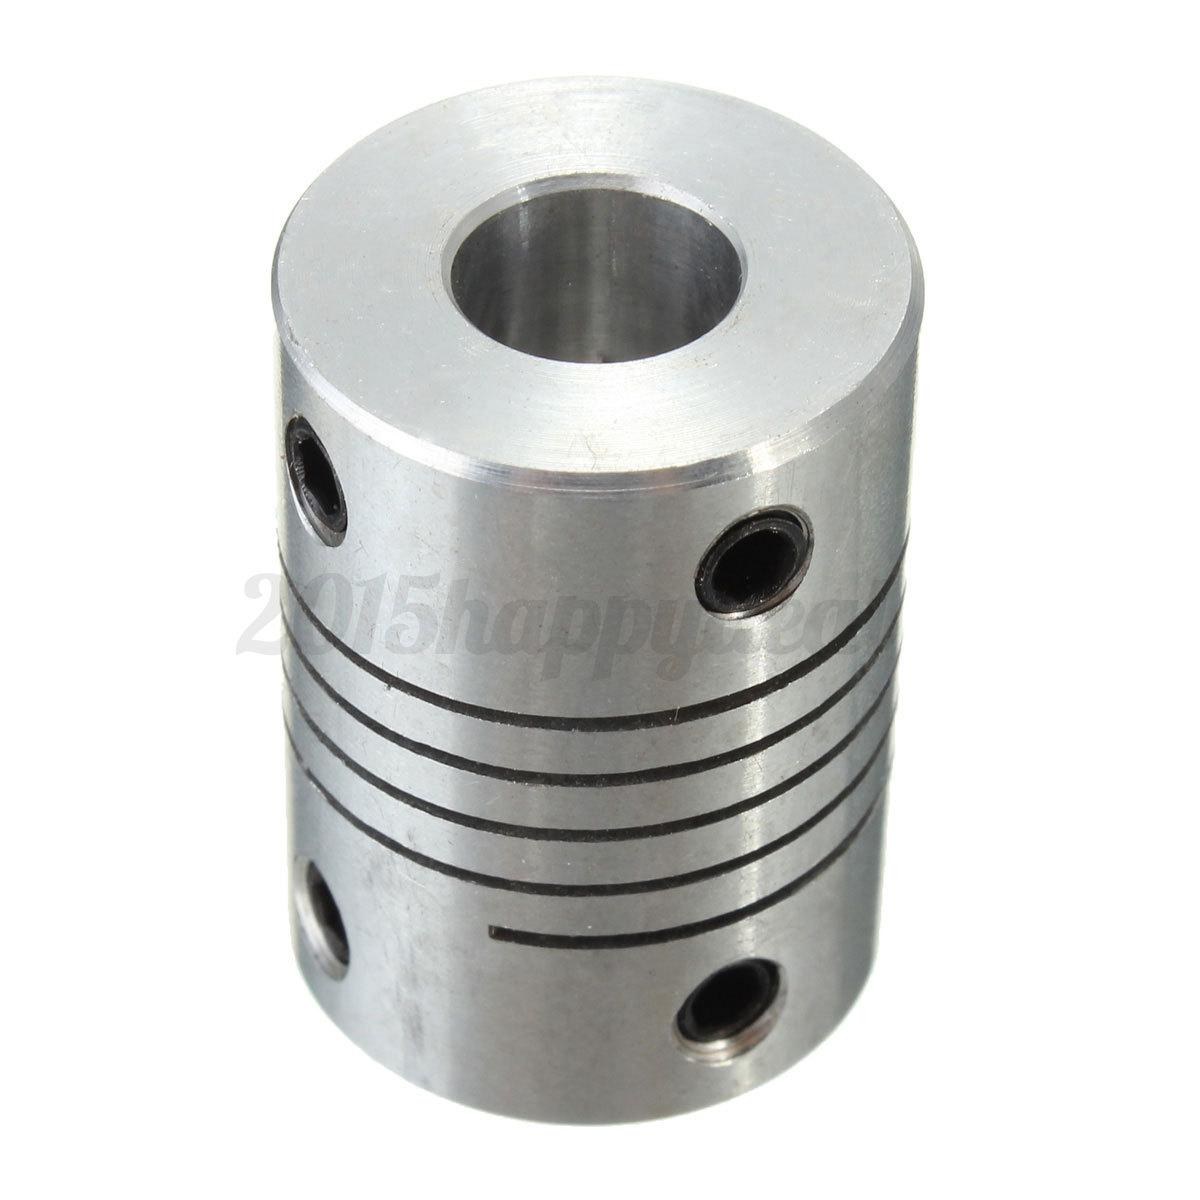 5 6 flexible shaft coupling rigid cnc stepper